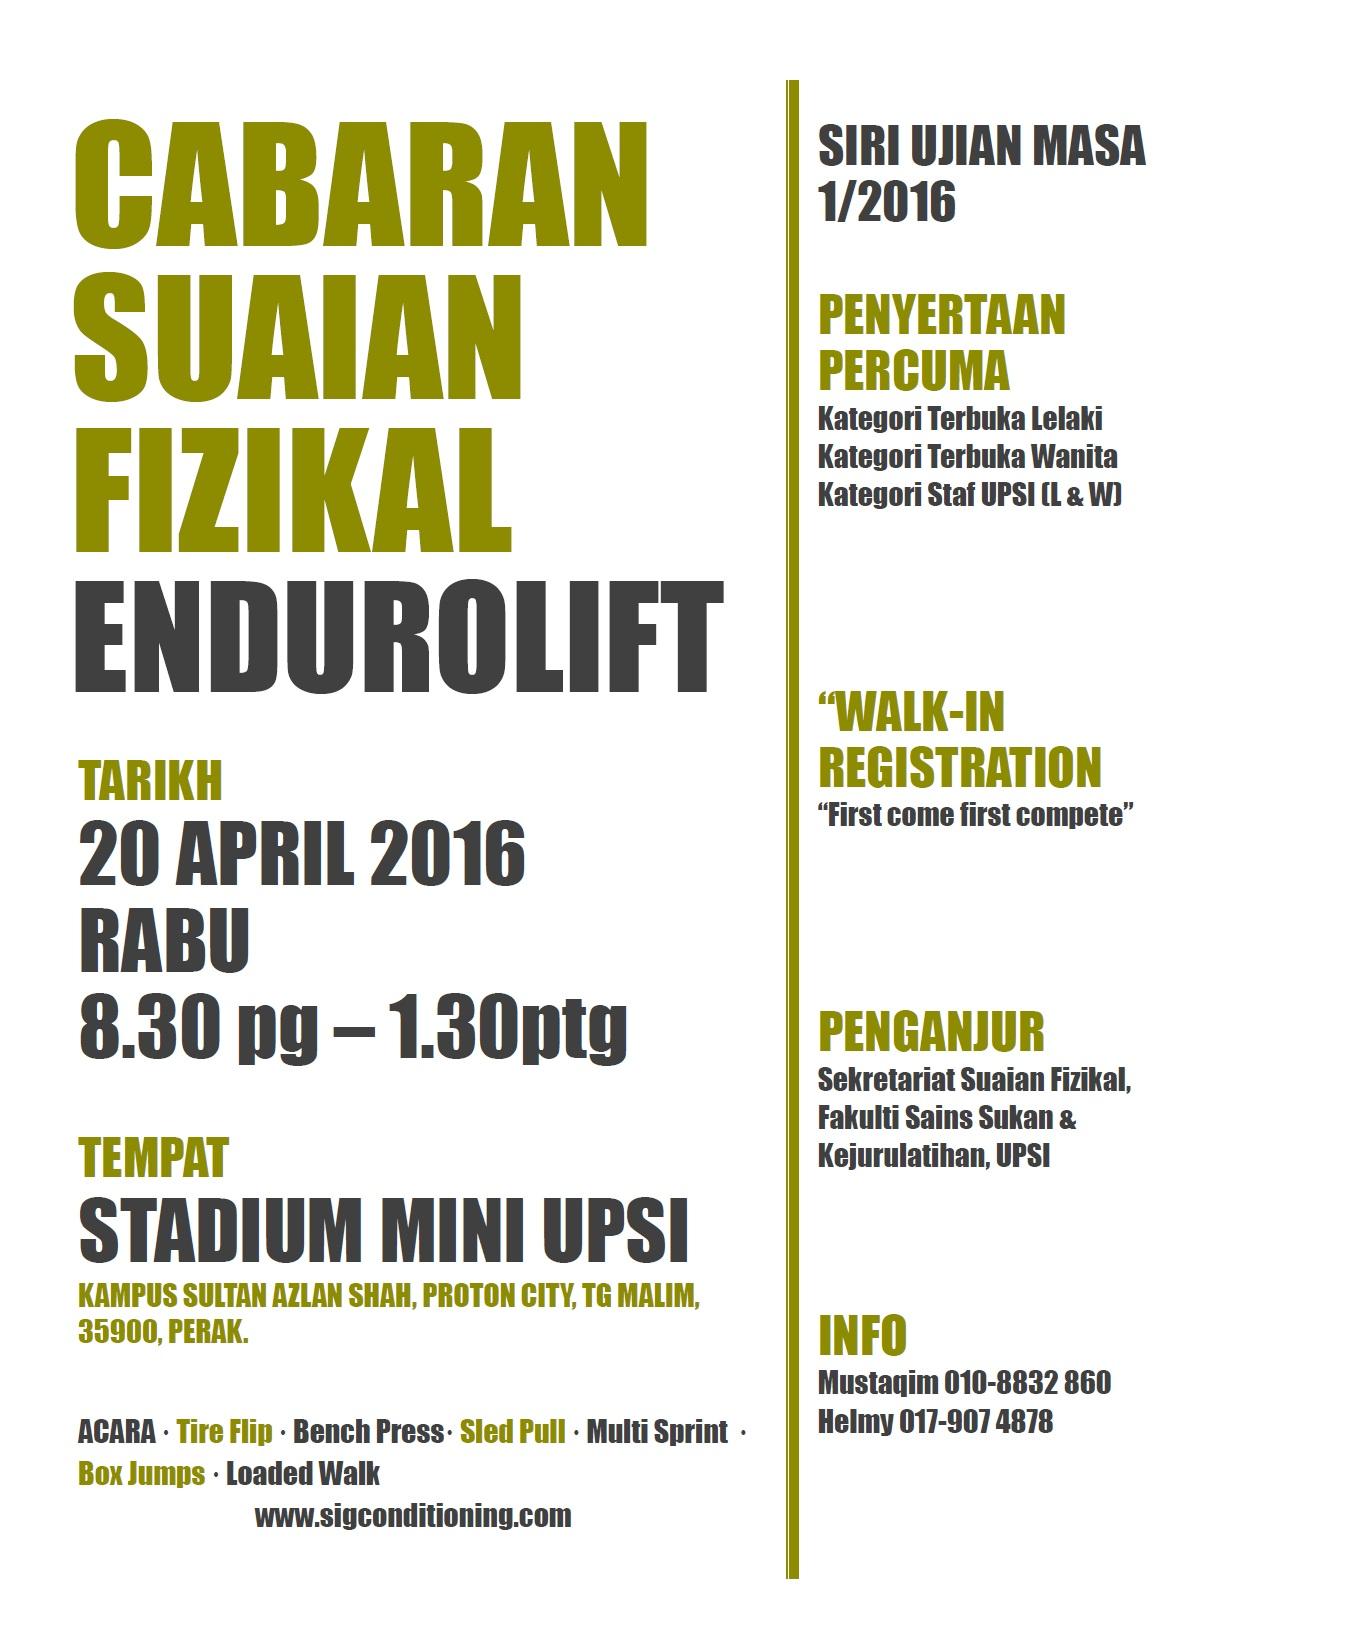 EnduroliftBM poster